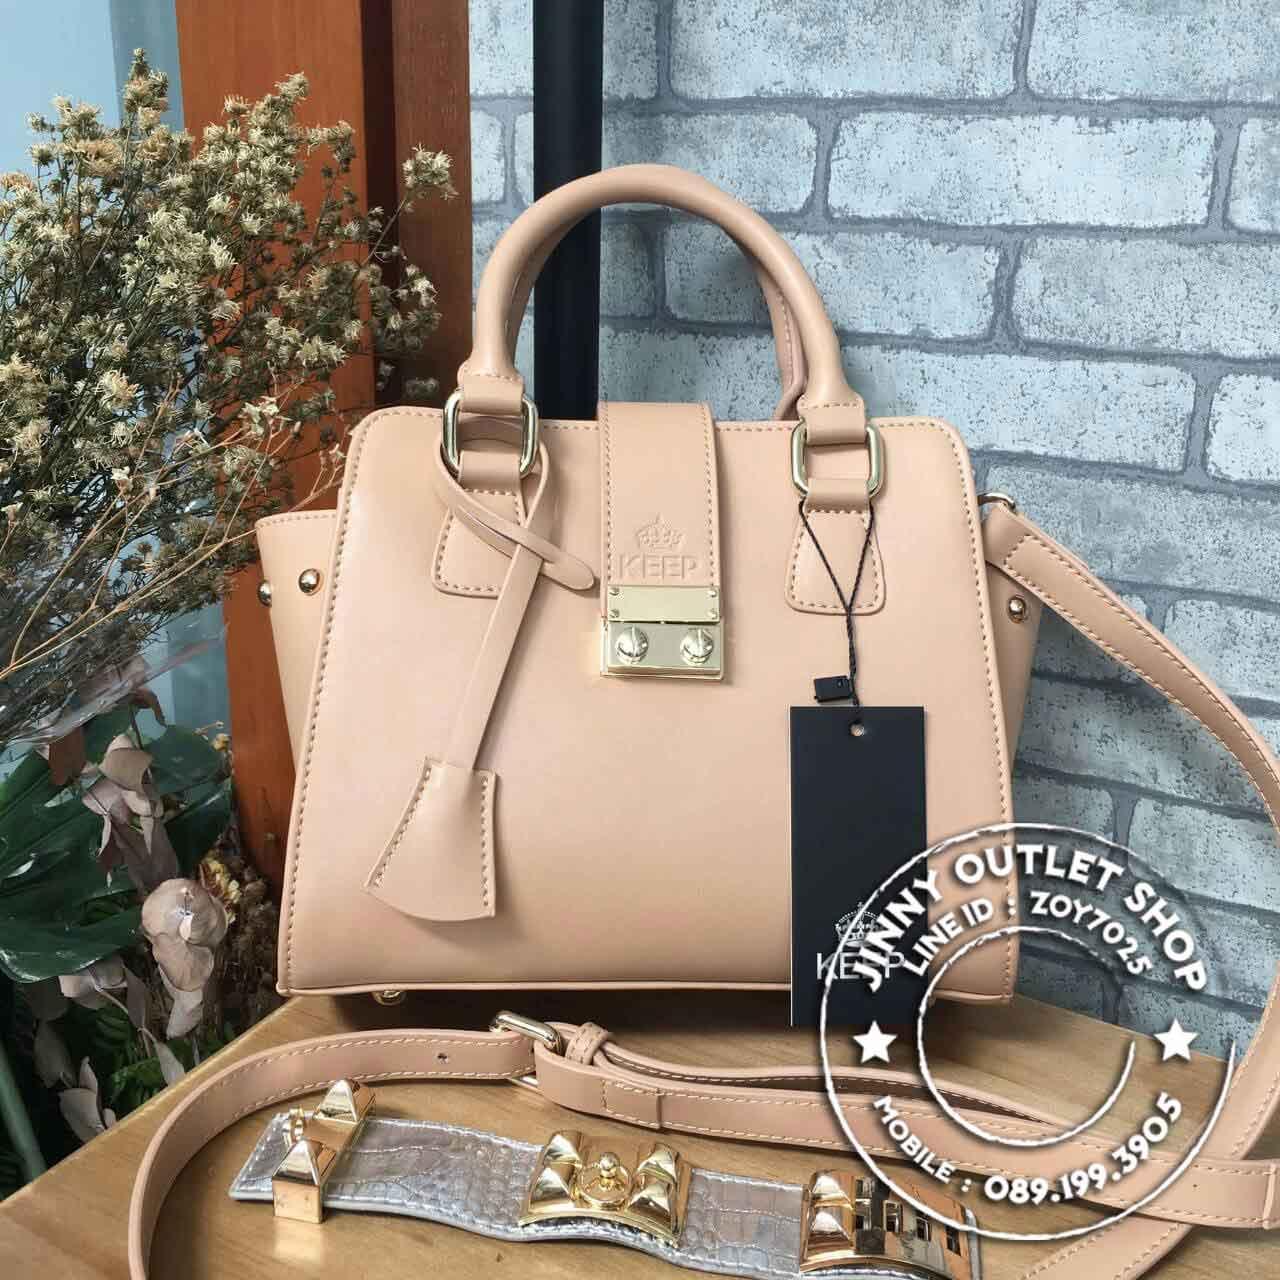 KEEP ( Passion On Handbag )